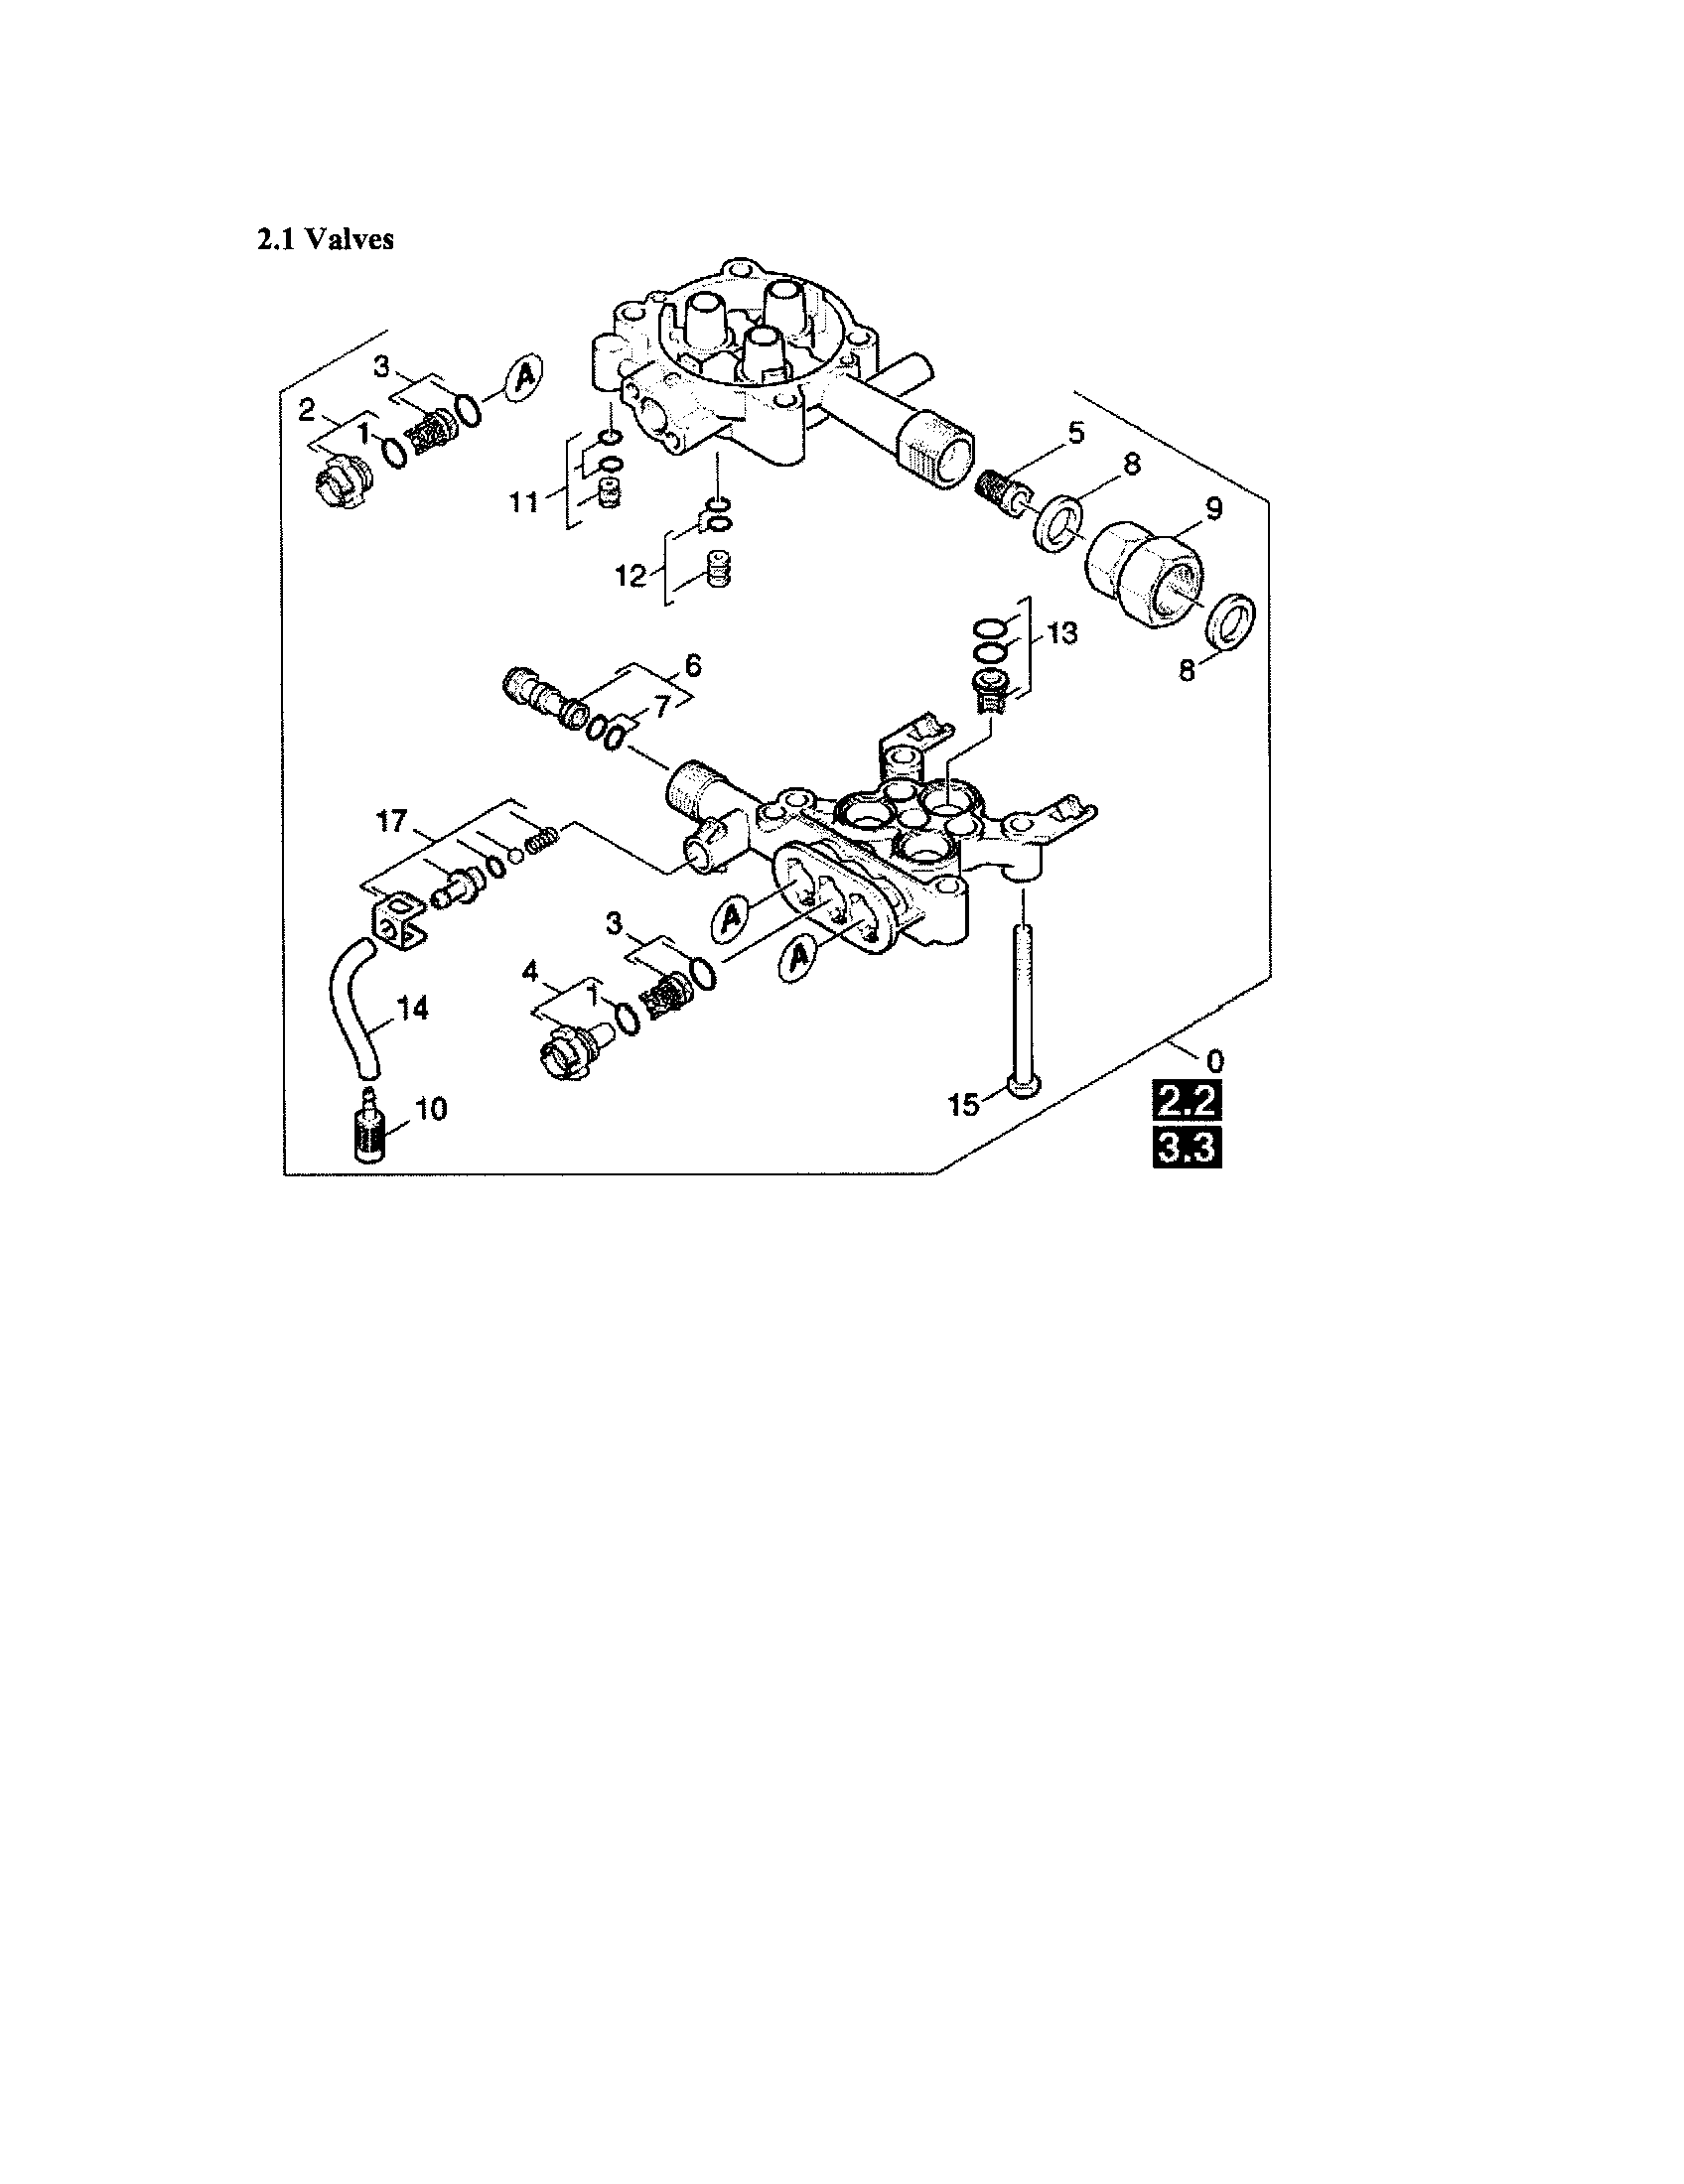 VALVES/PUMP SET Diagram & Parts List for Model K4400G